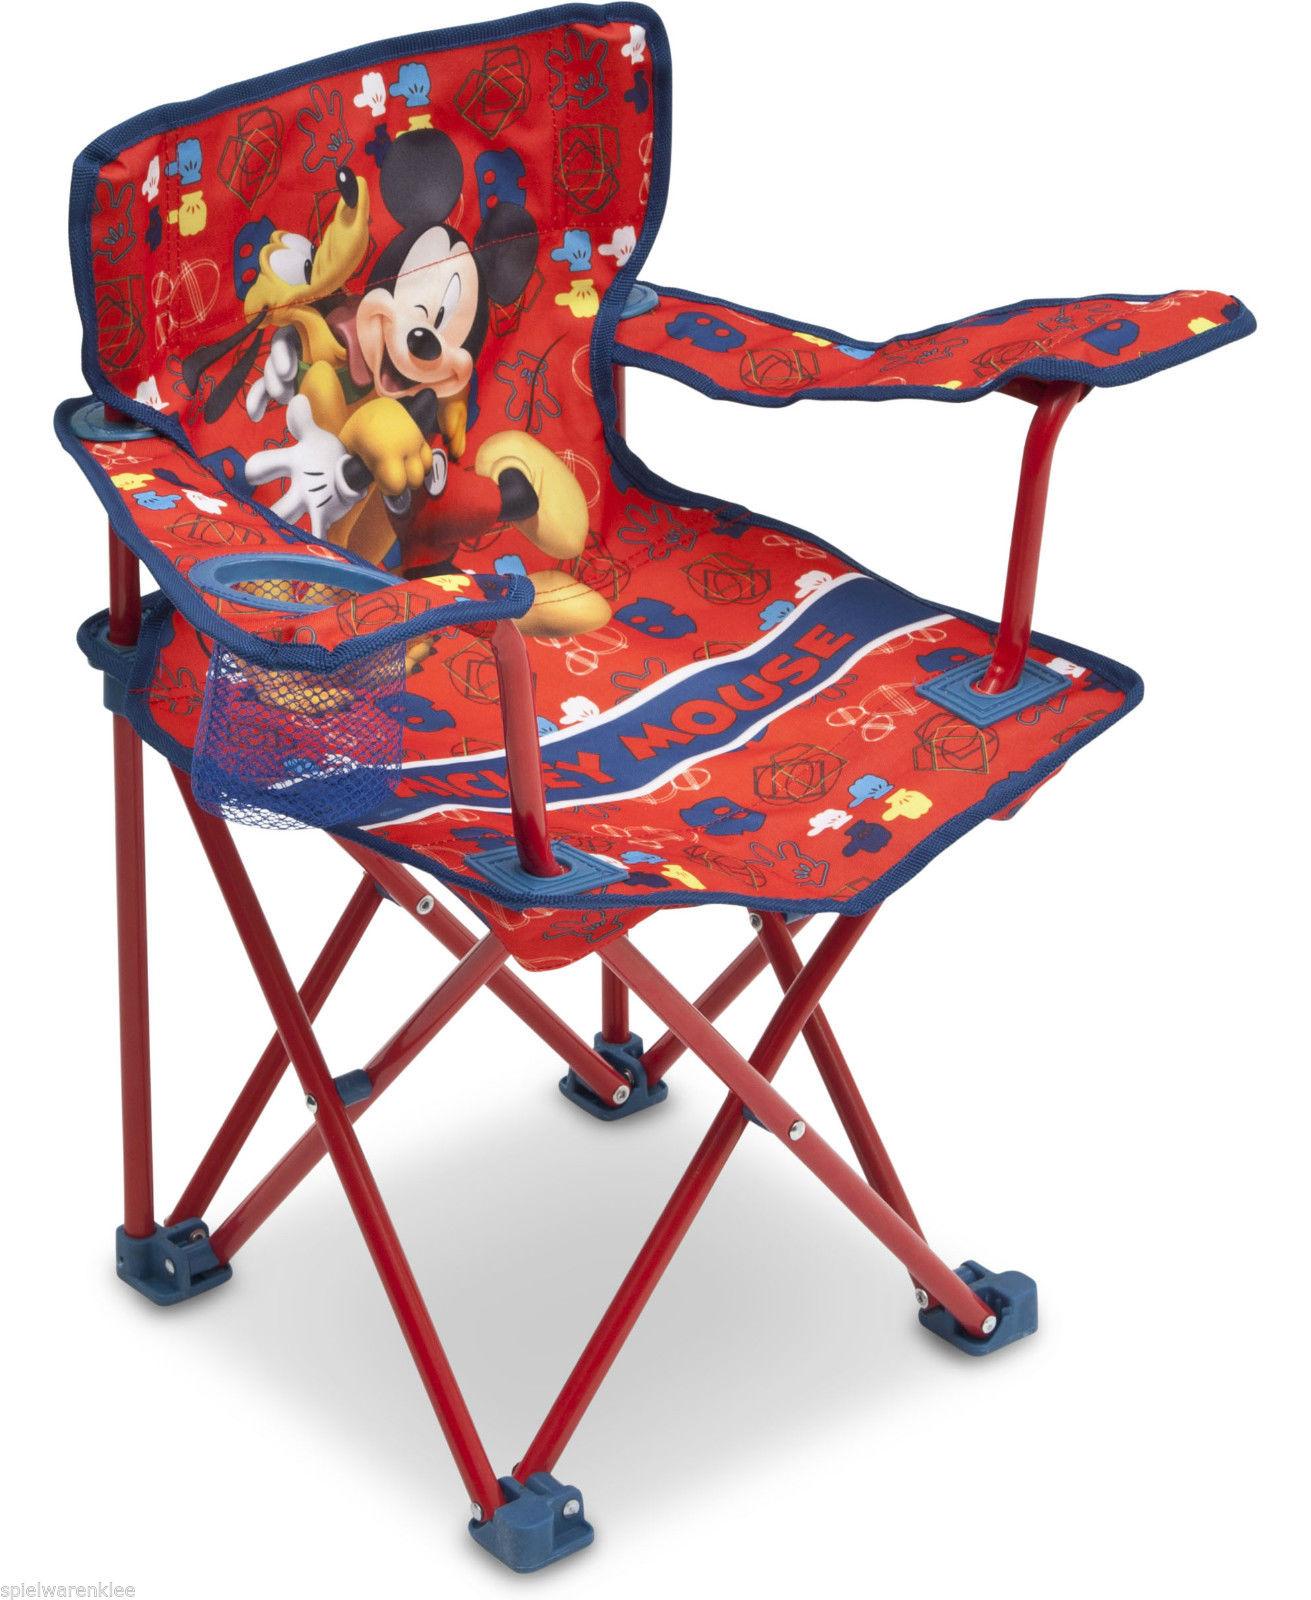 Micky Maus Klappstuhl Campingstuhl Sessel Kindersessel